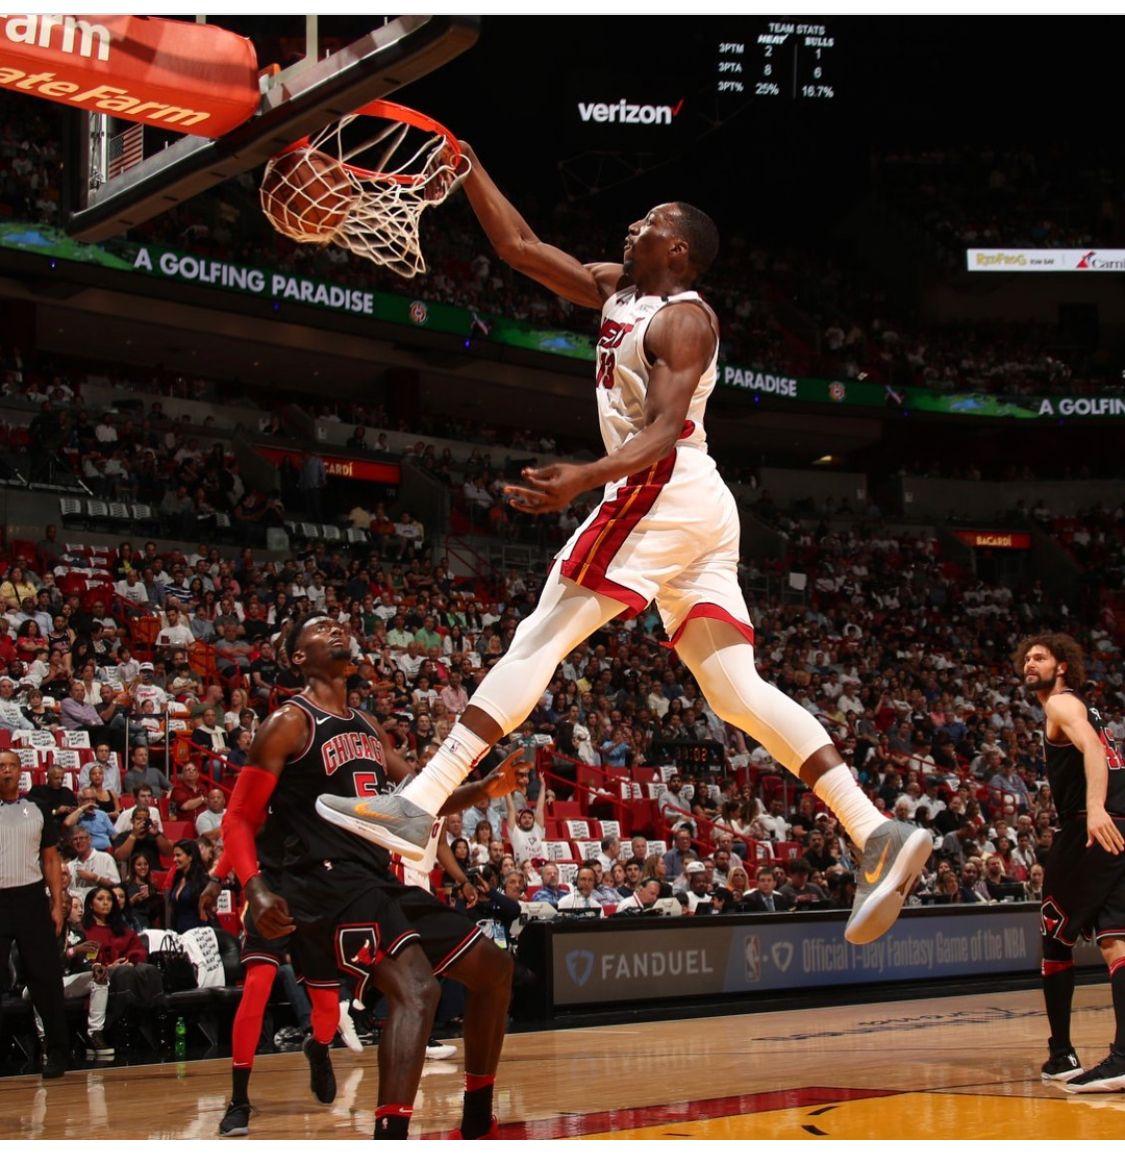 Bam Adebayo Miamiheat 2018 Miami Heat Kelly Olynyk Miami